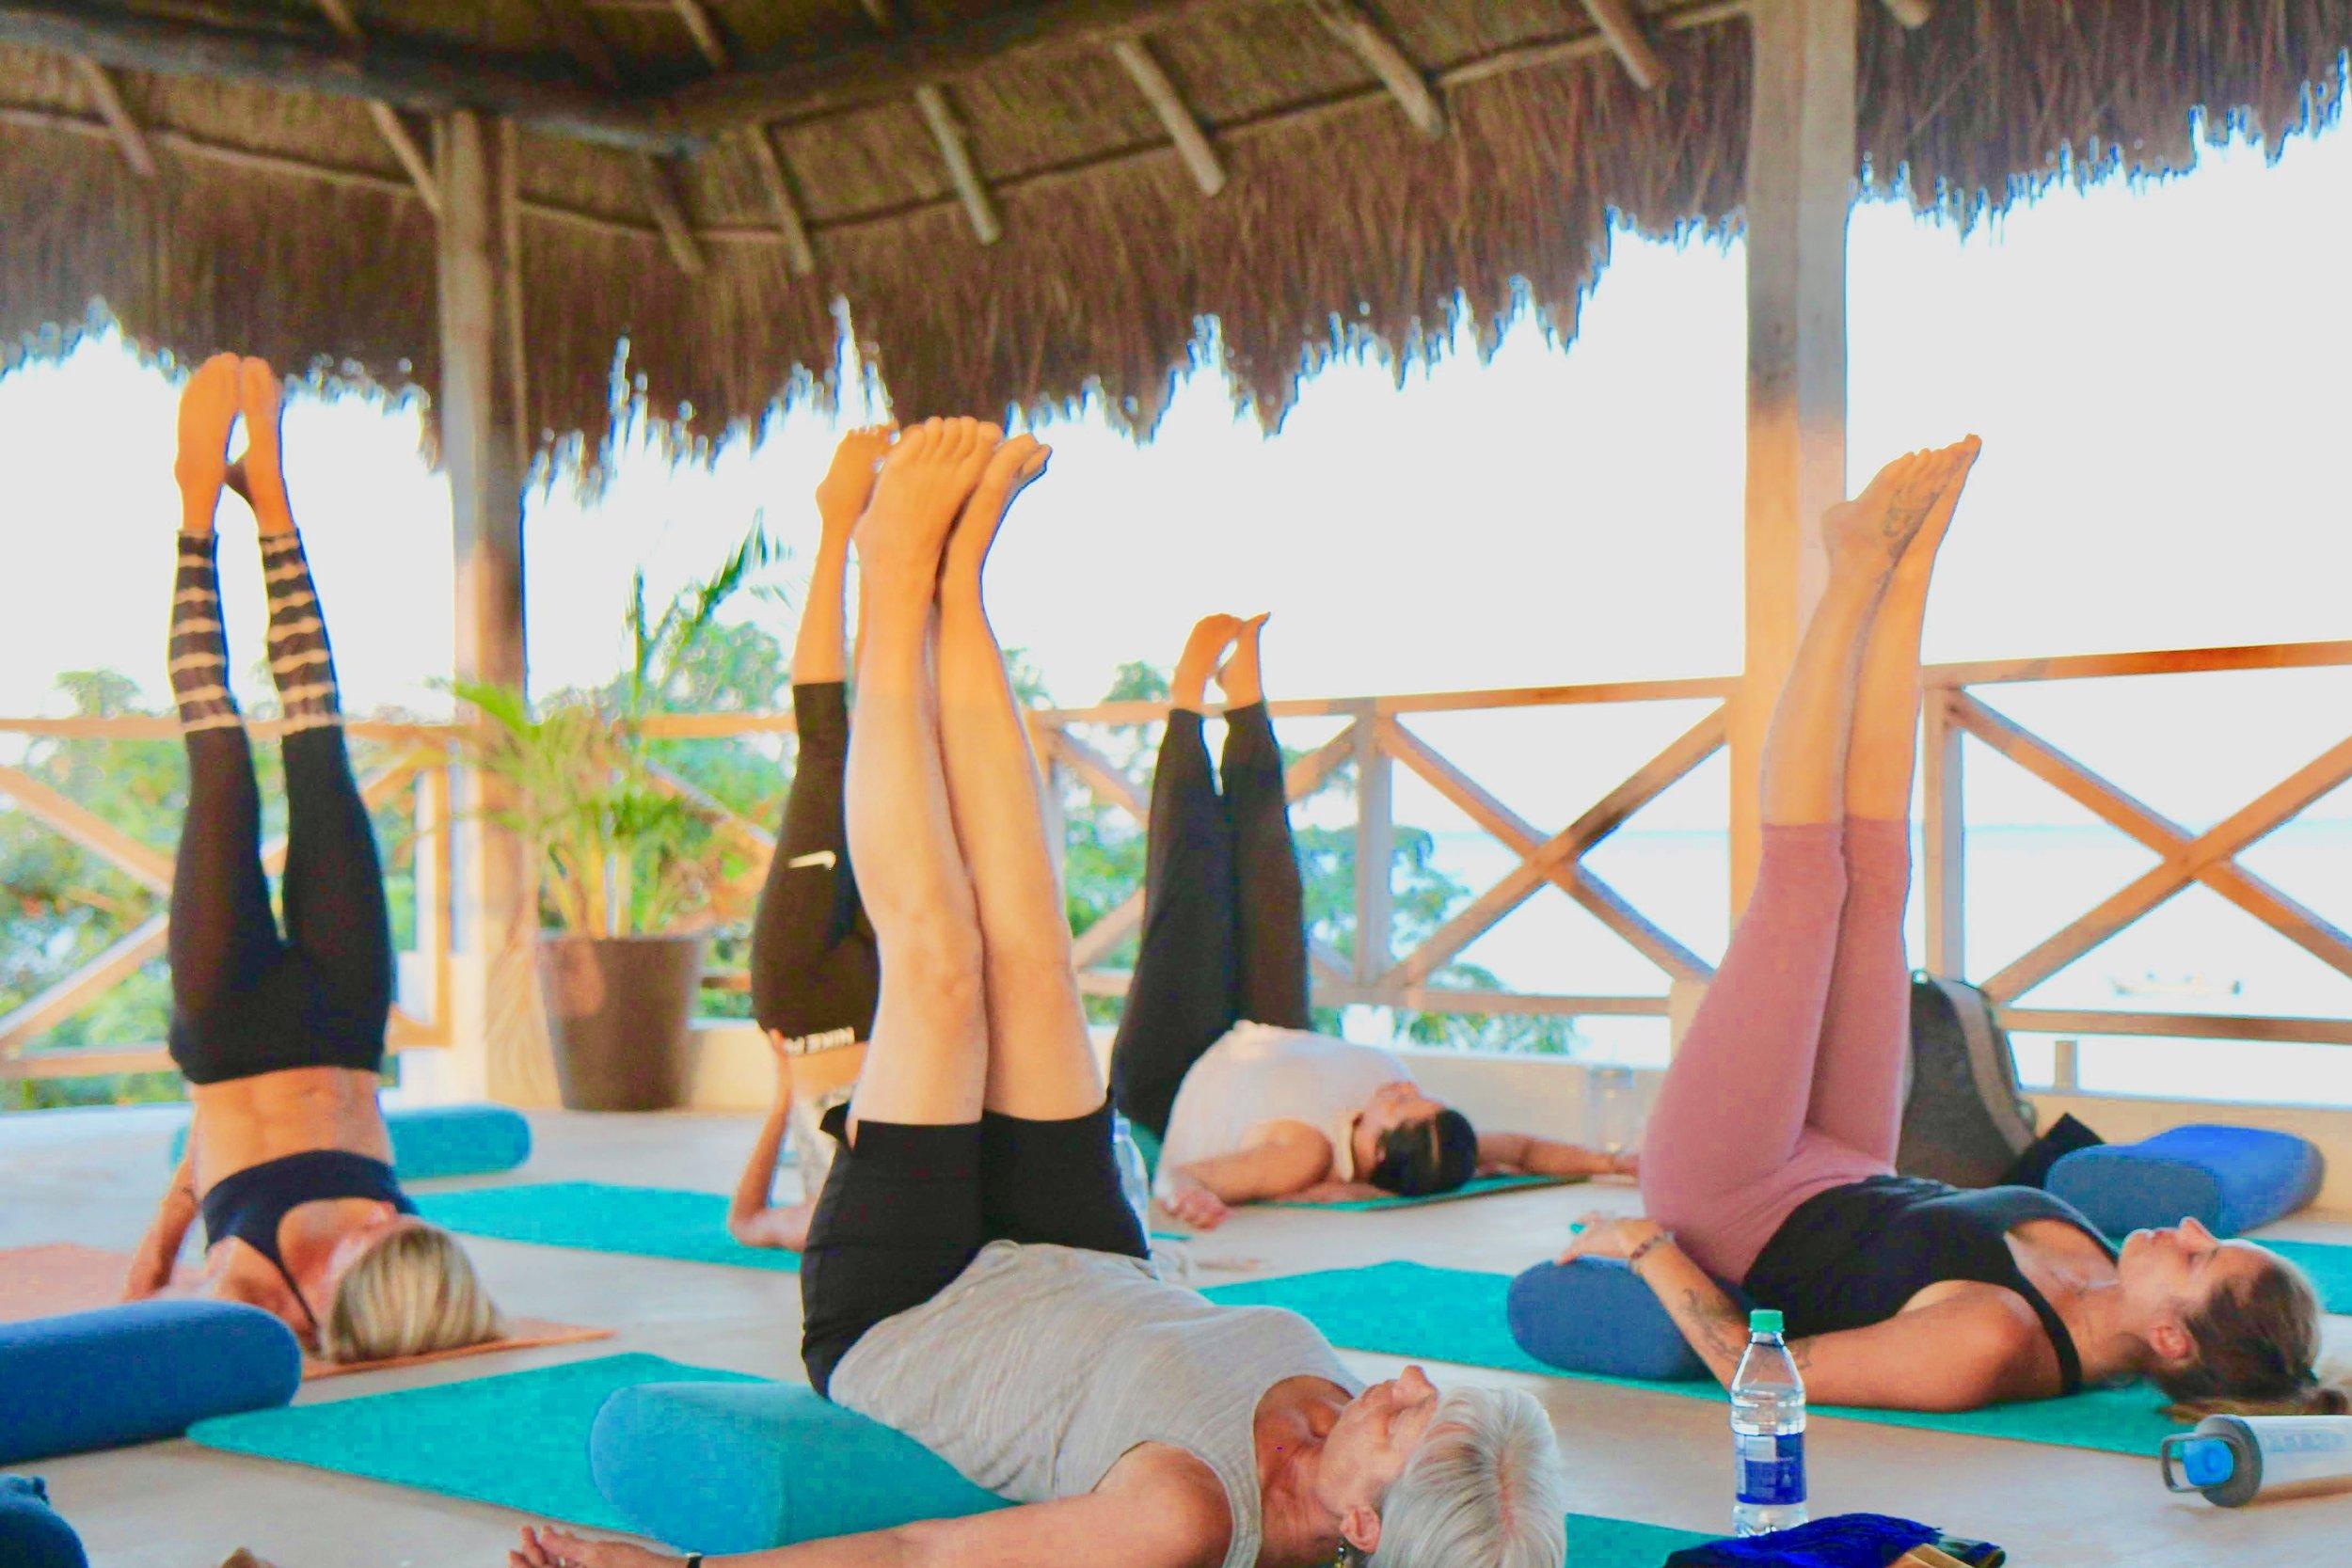 Coco B Yoga Group Viparita Karani Pose